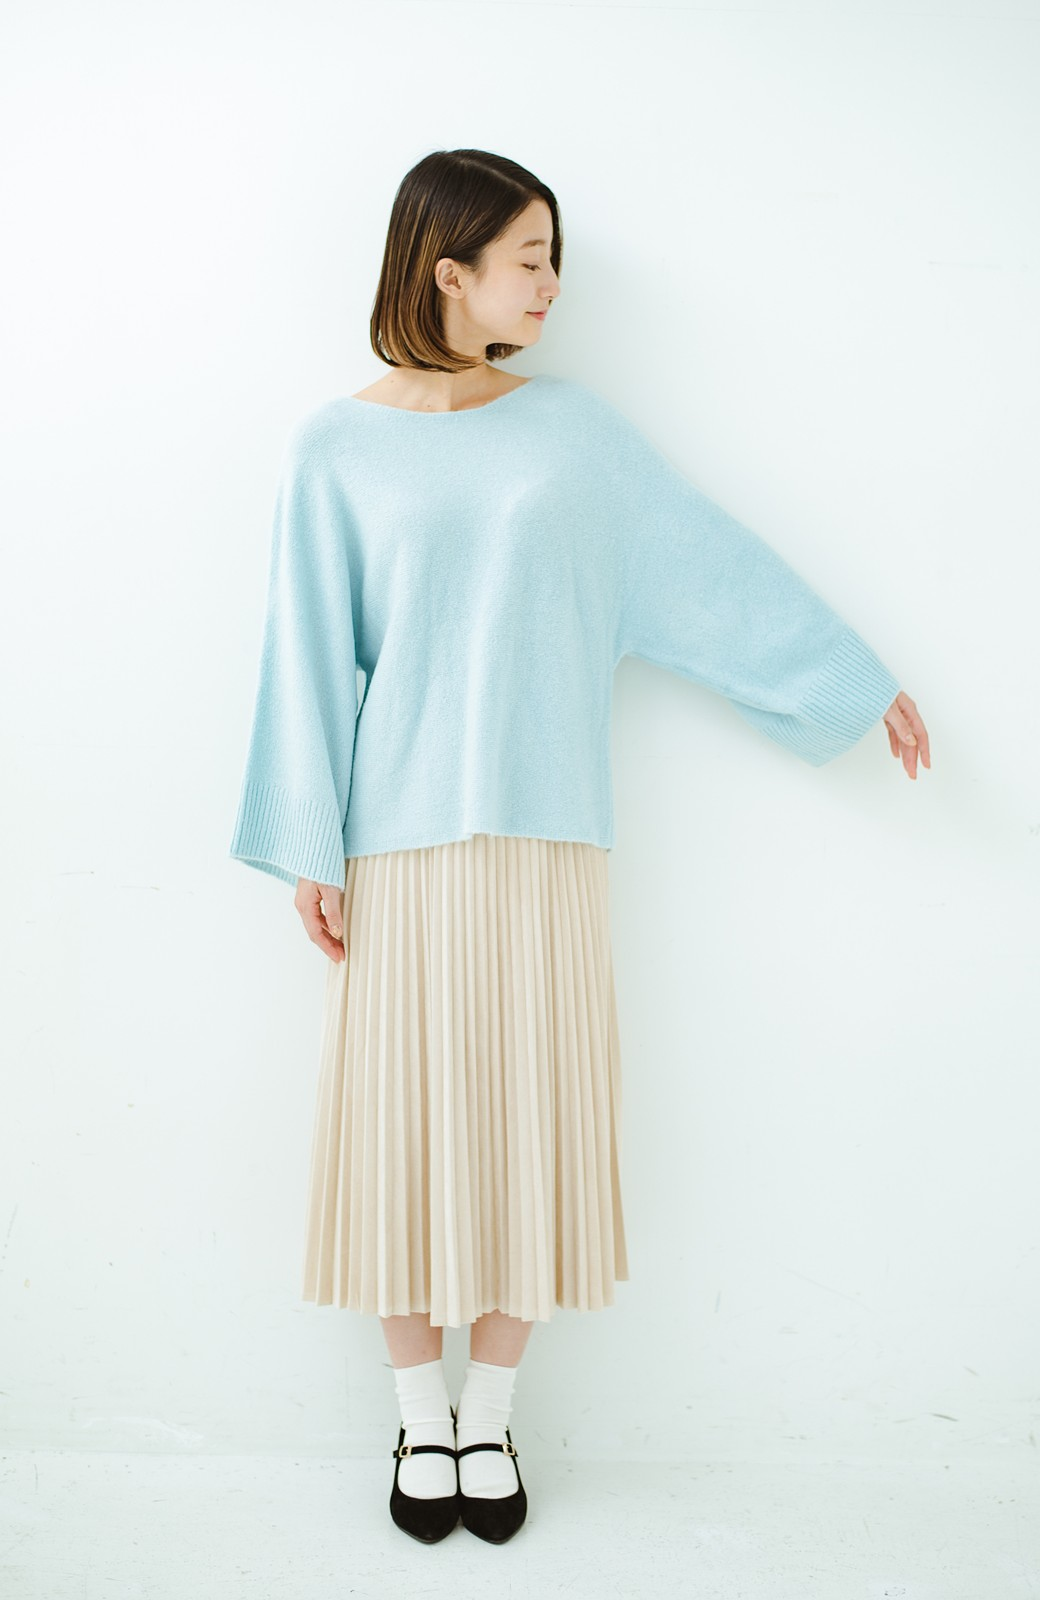 haco! 太め袖がかわいい横編みプルオーバーニット <ライトブルー>の商品写真9